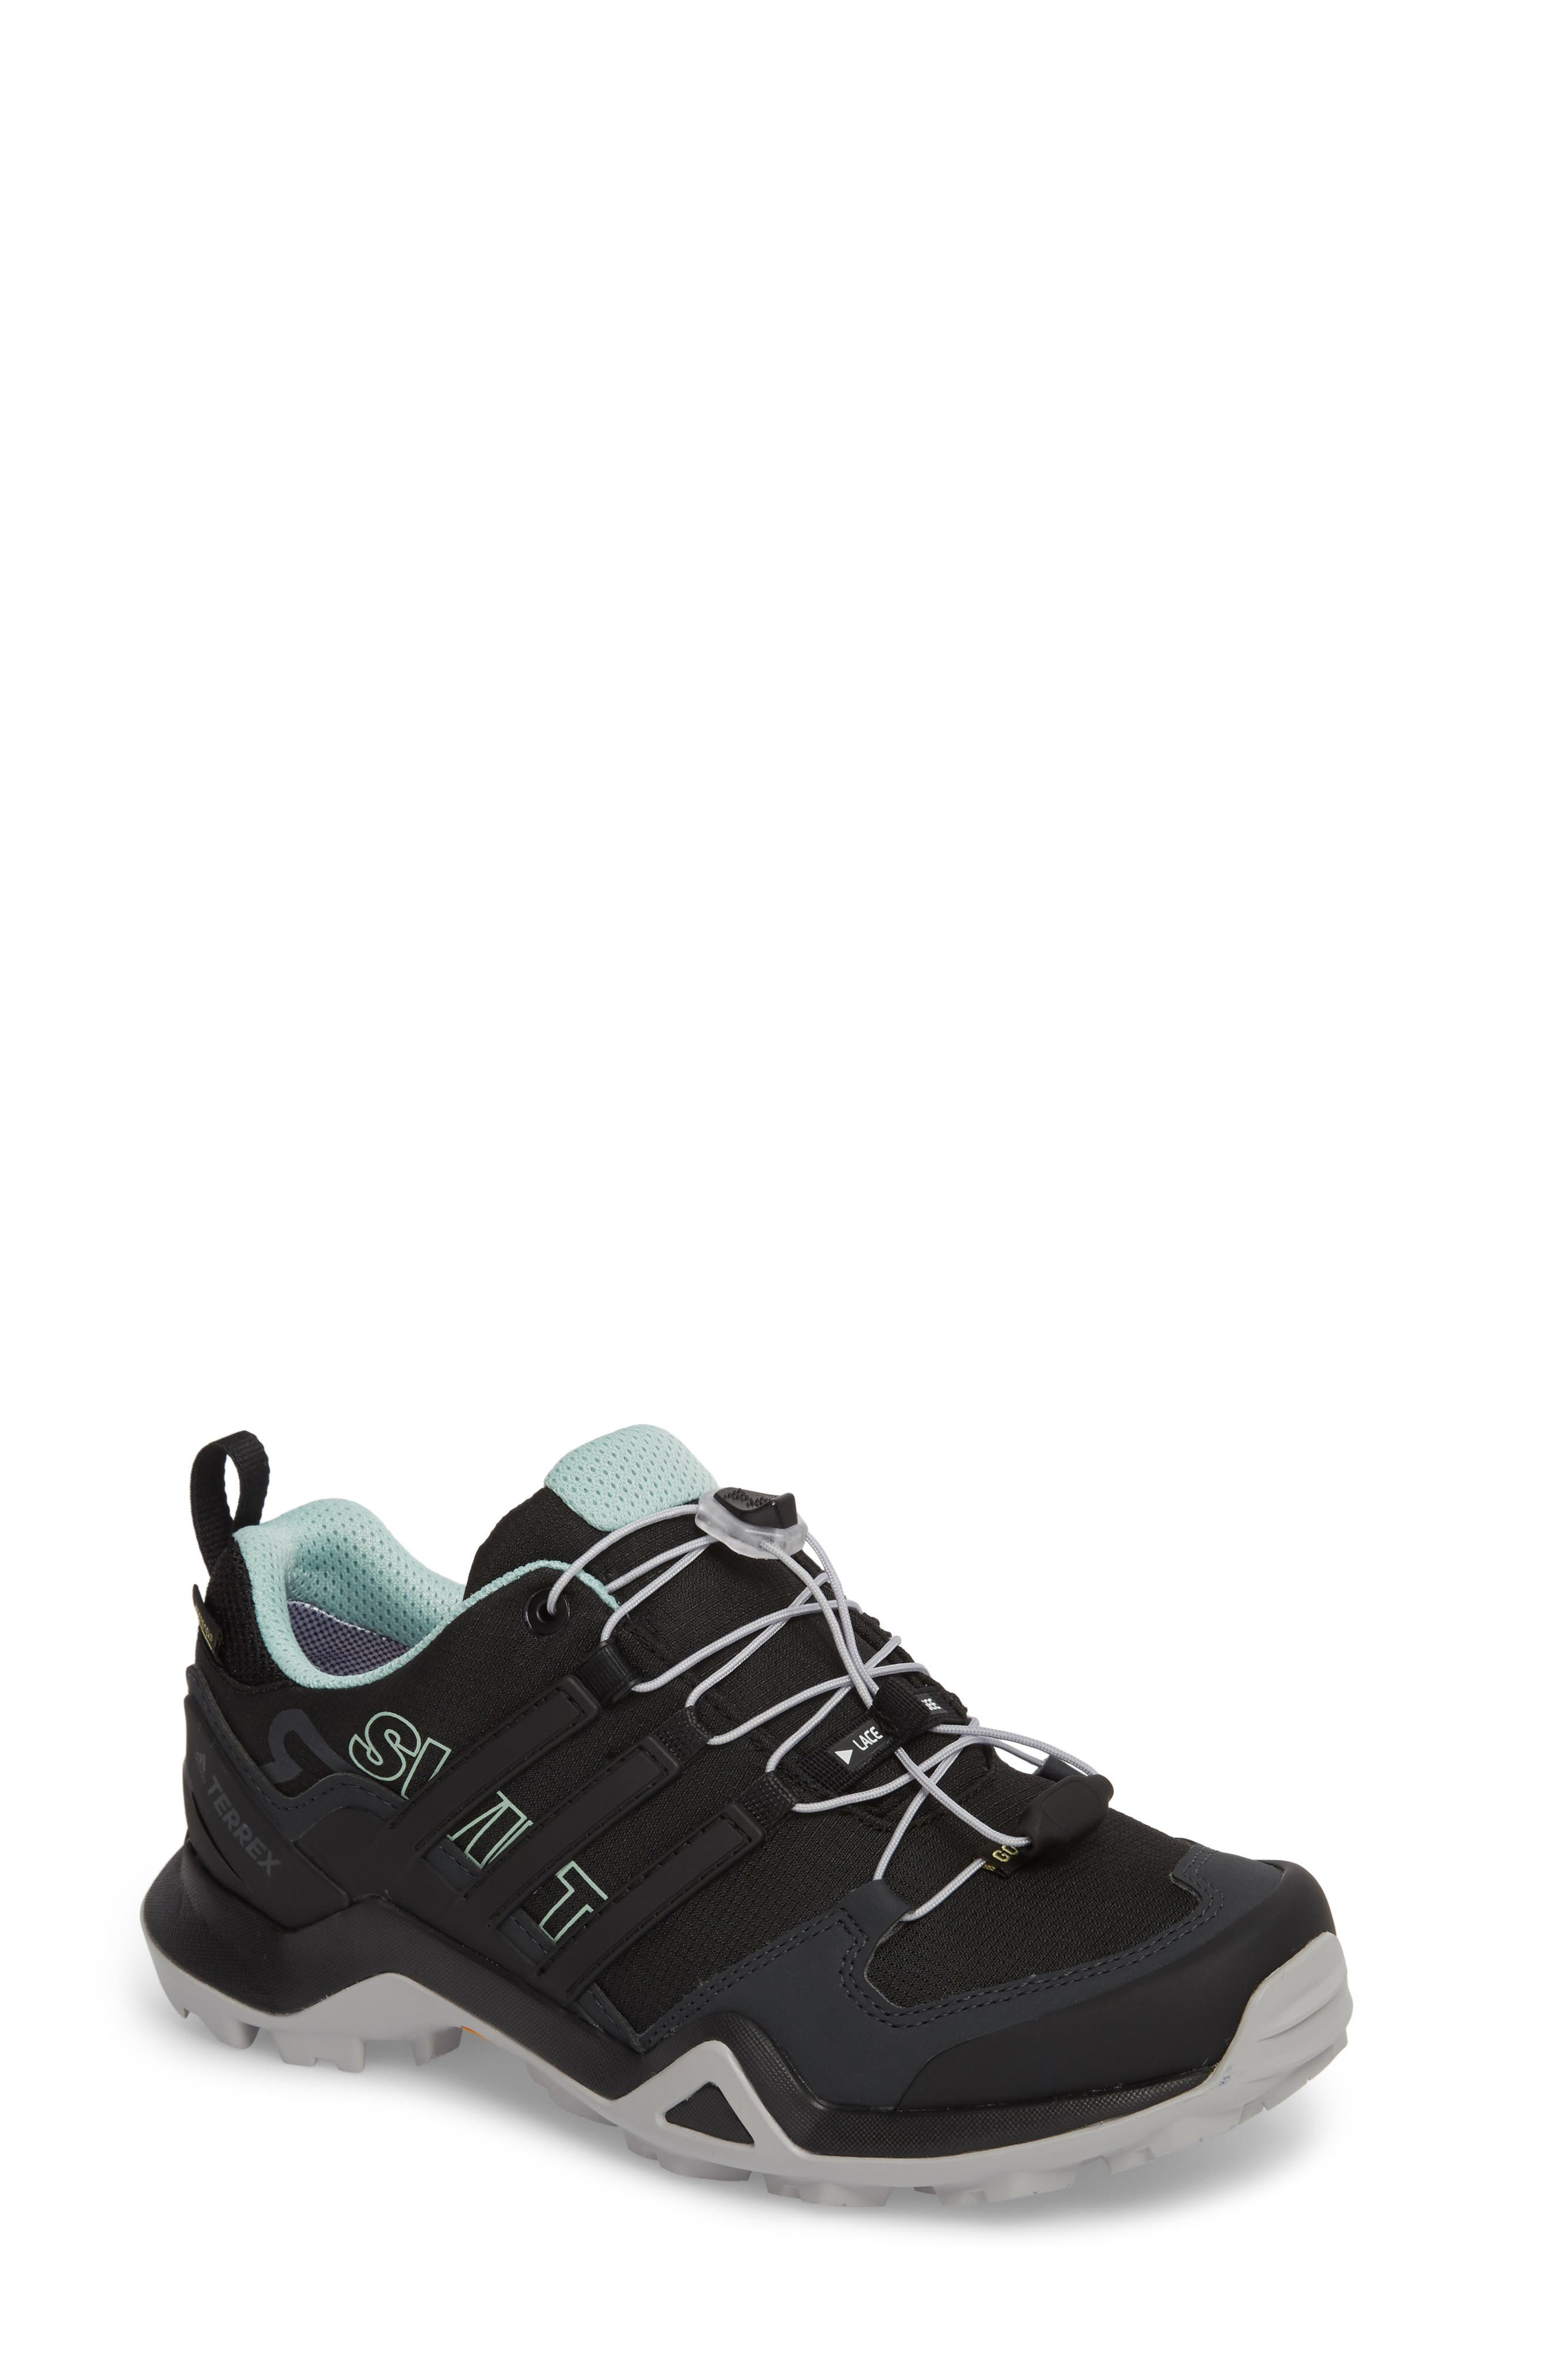 Terrex Swift R2 Gore-Tex<sup>®</sup> Hiking Shoe,                             Main thumbnail 1, color,                             Black/ Black/ Ash Green